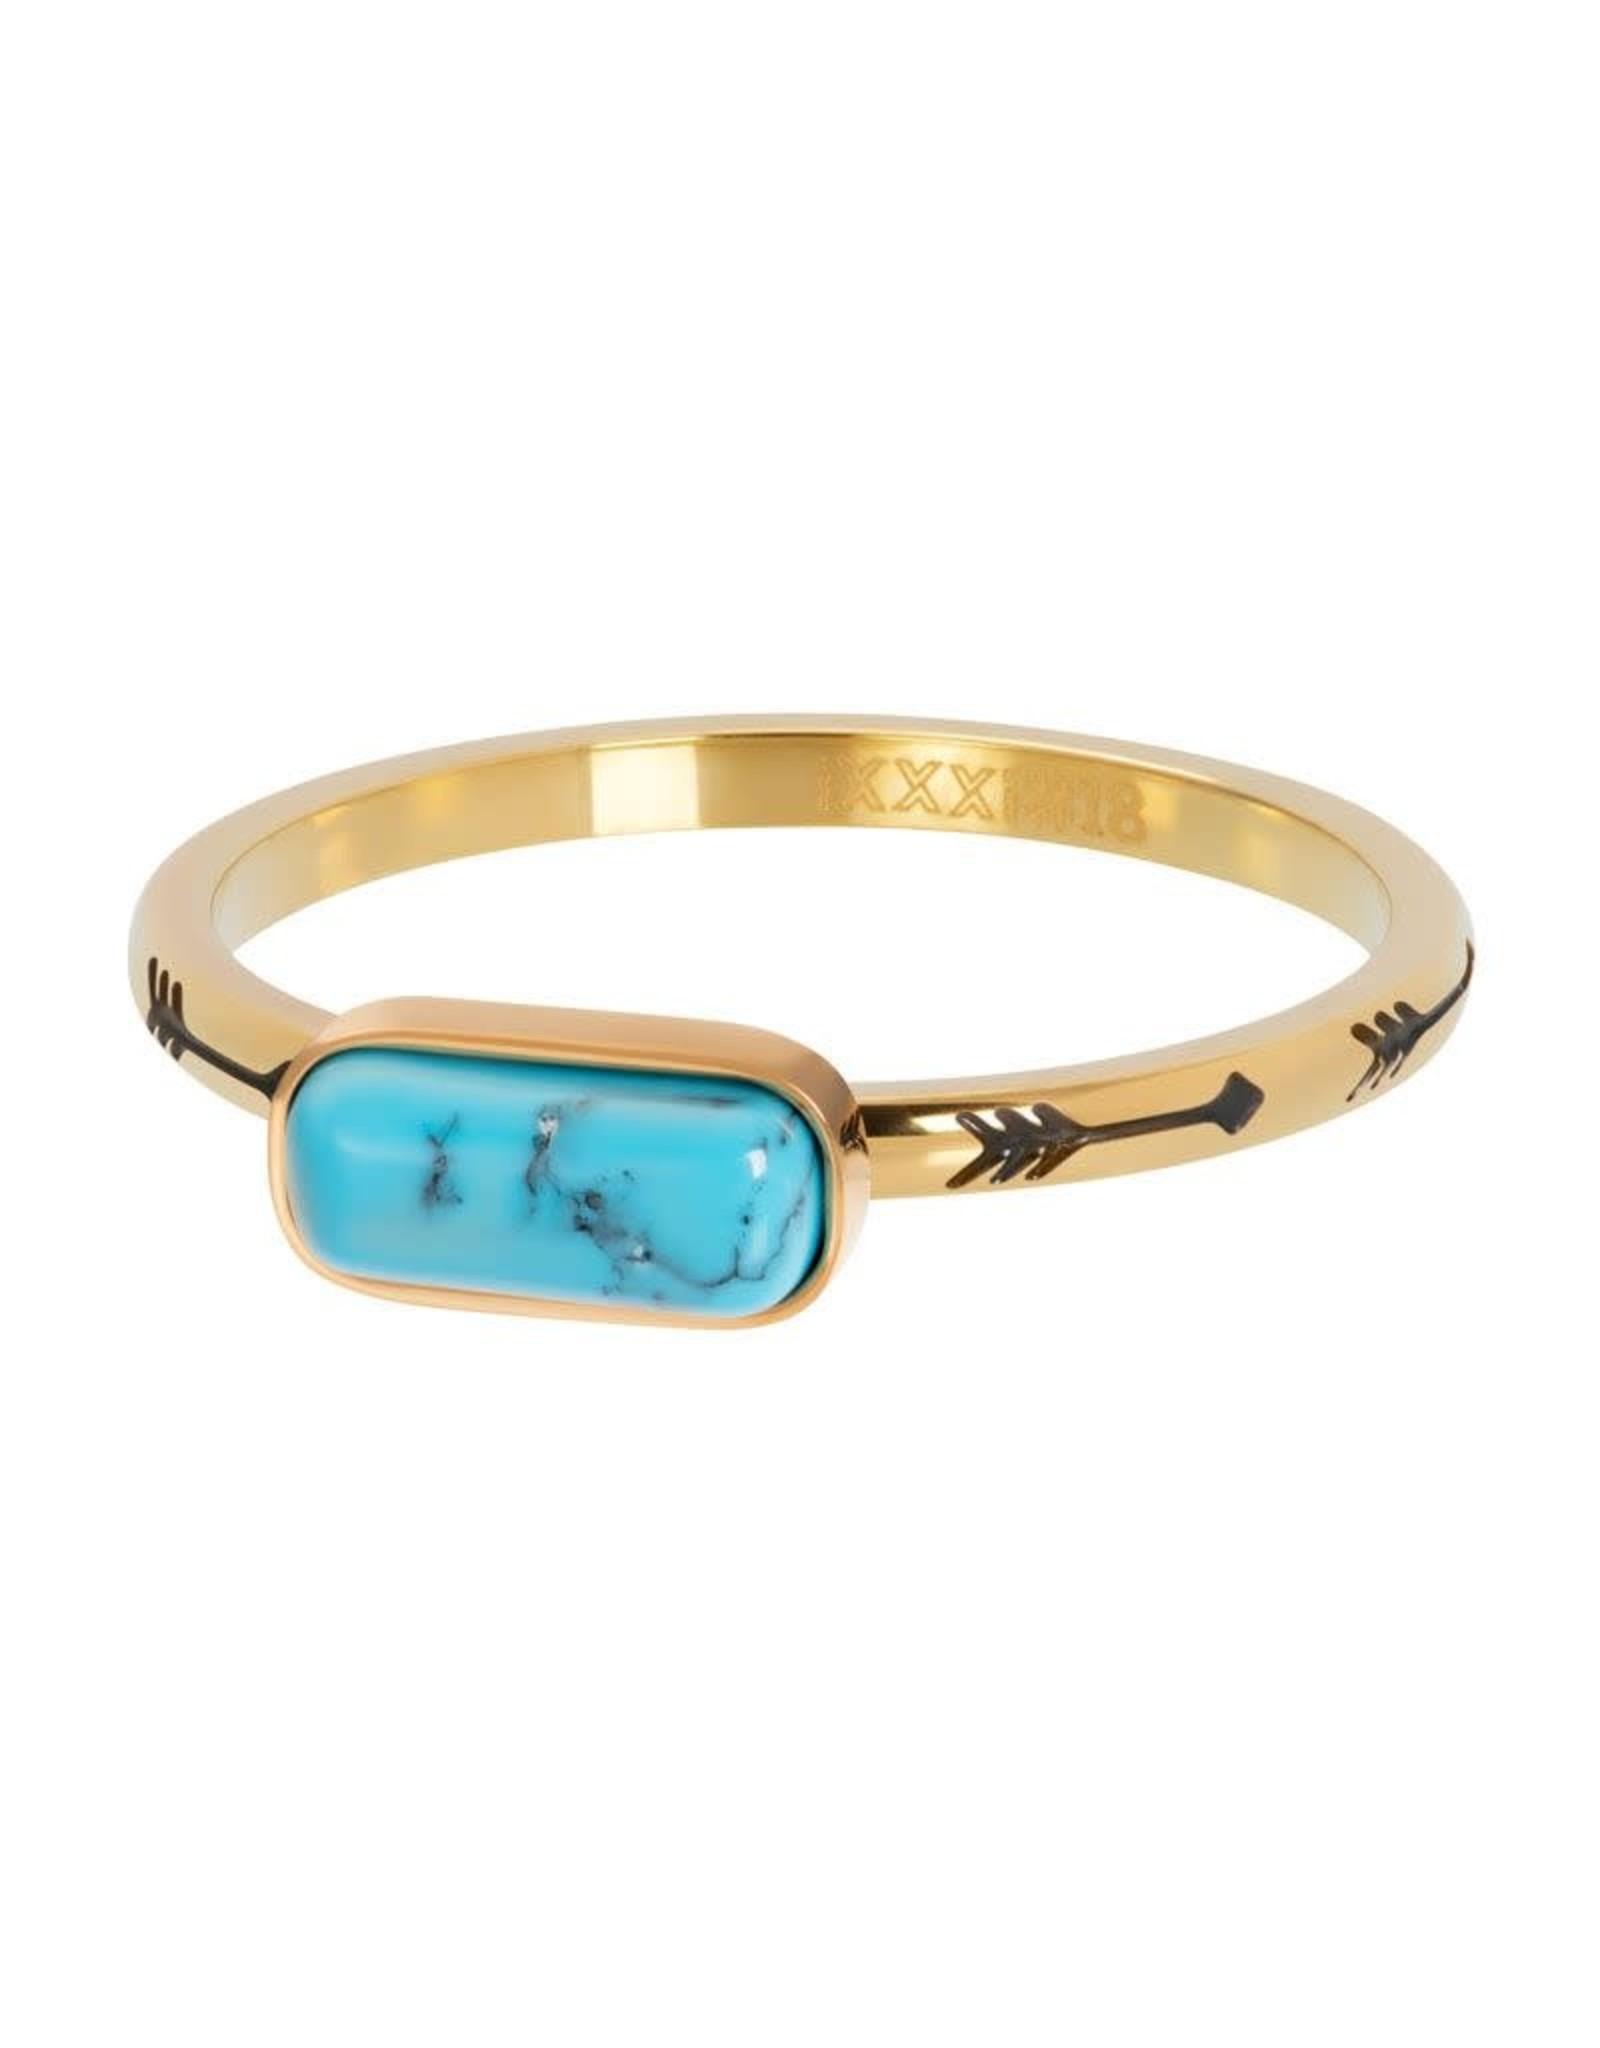 iXXXi Jewelry iXXXi vulring Festival blue - goud